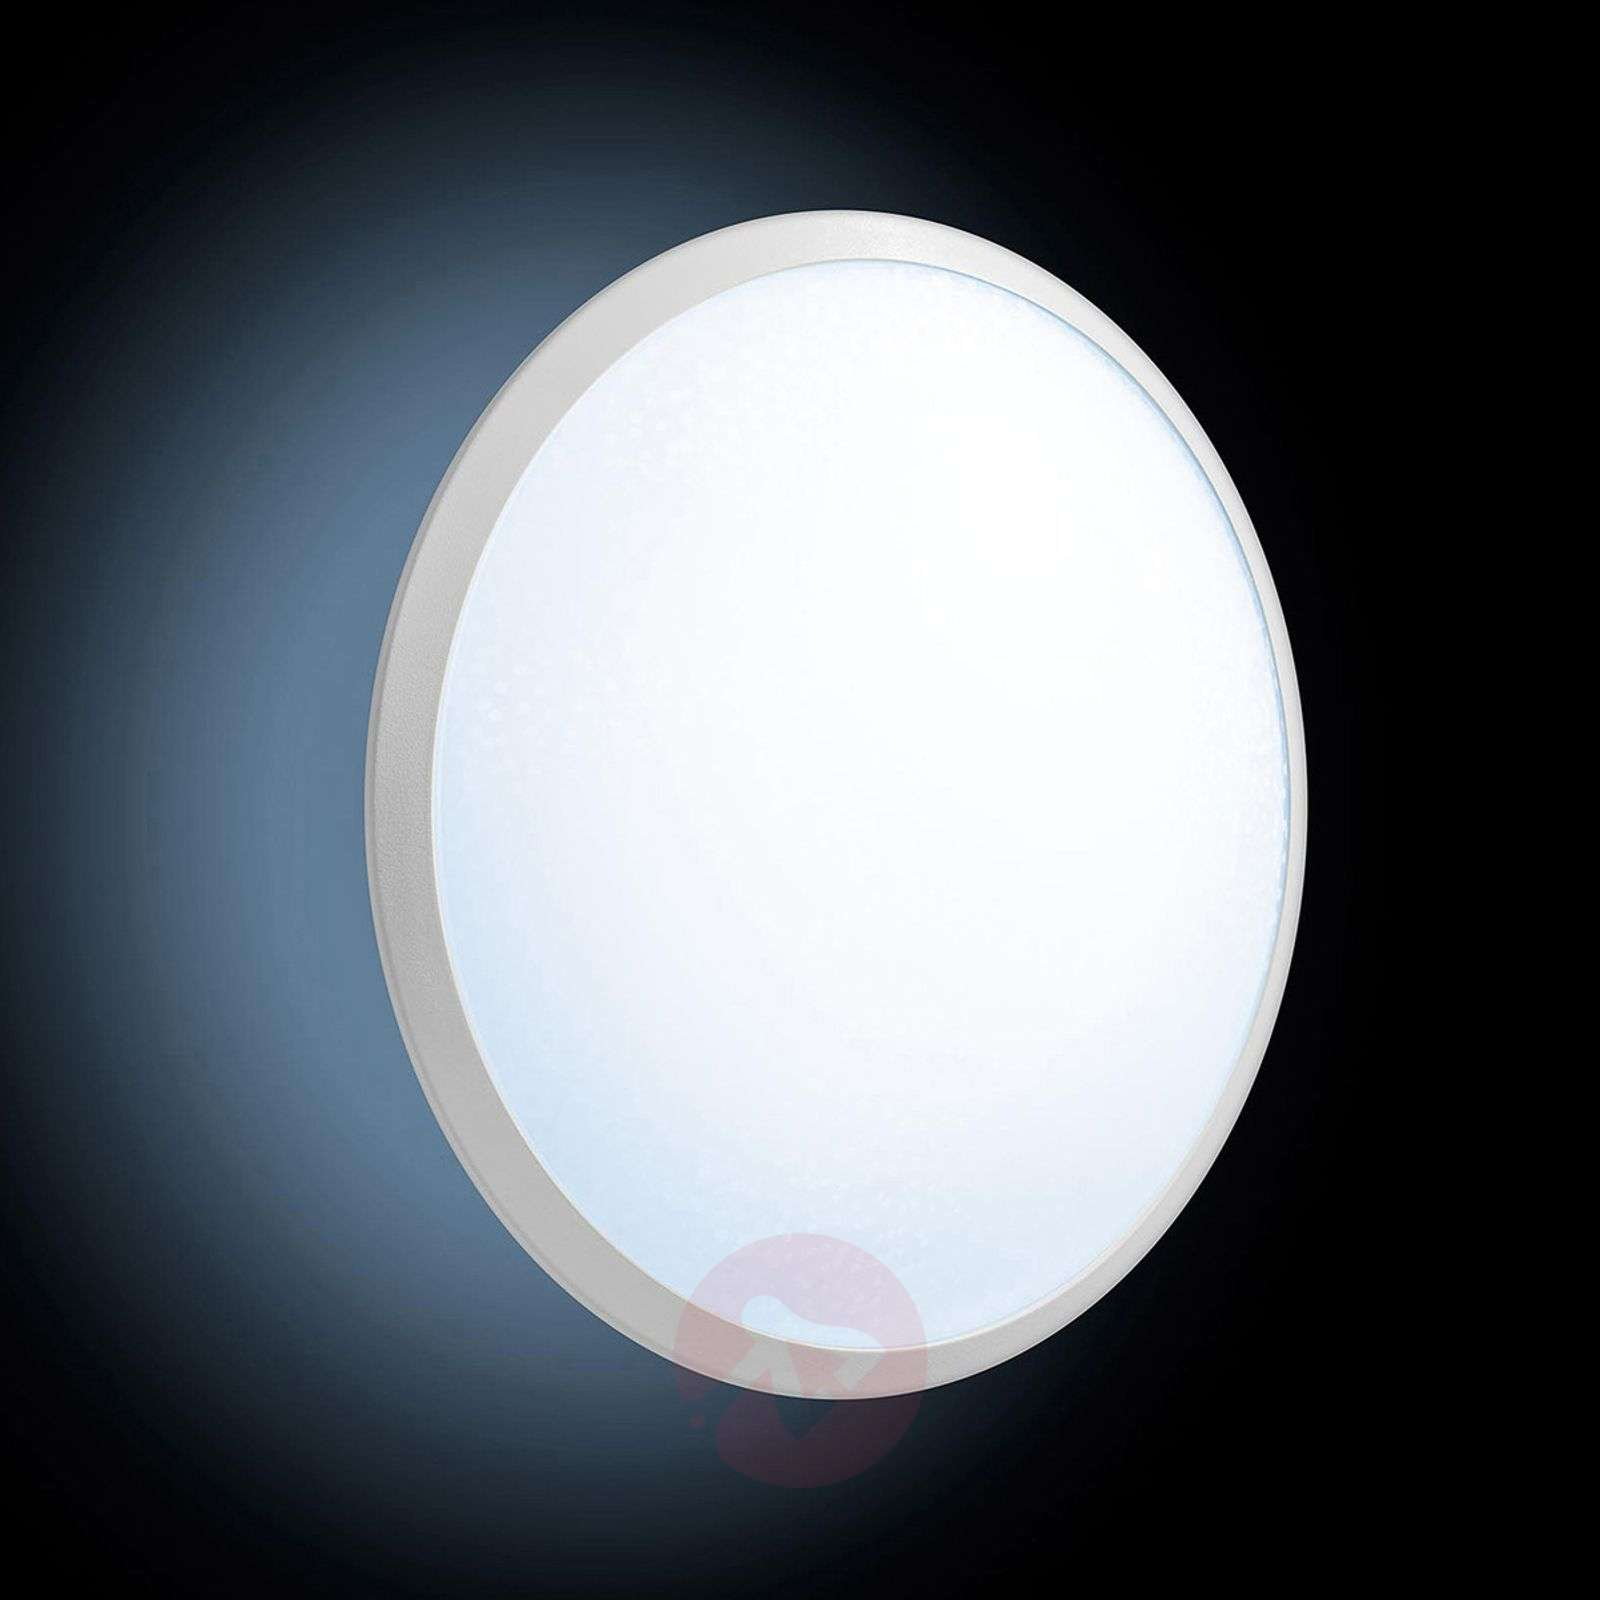 LED wall light Philips Hue Phoenix, white ambiance-7531607-01